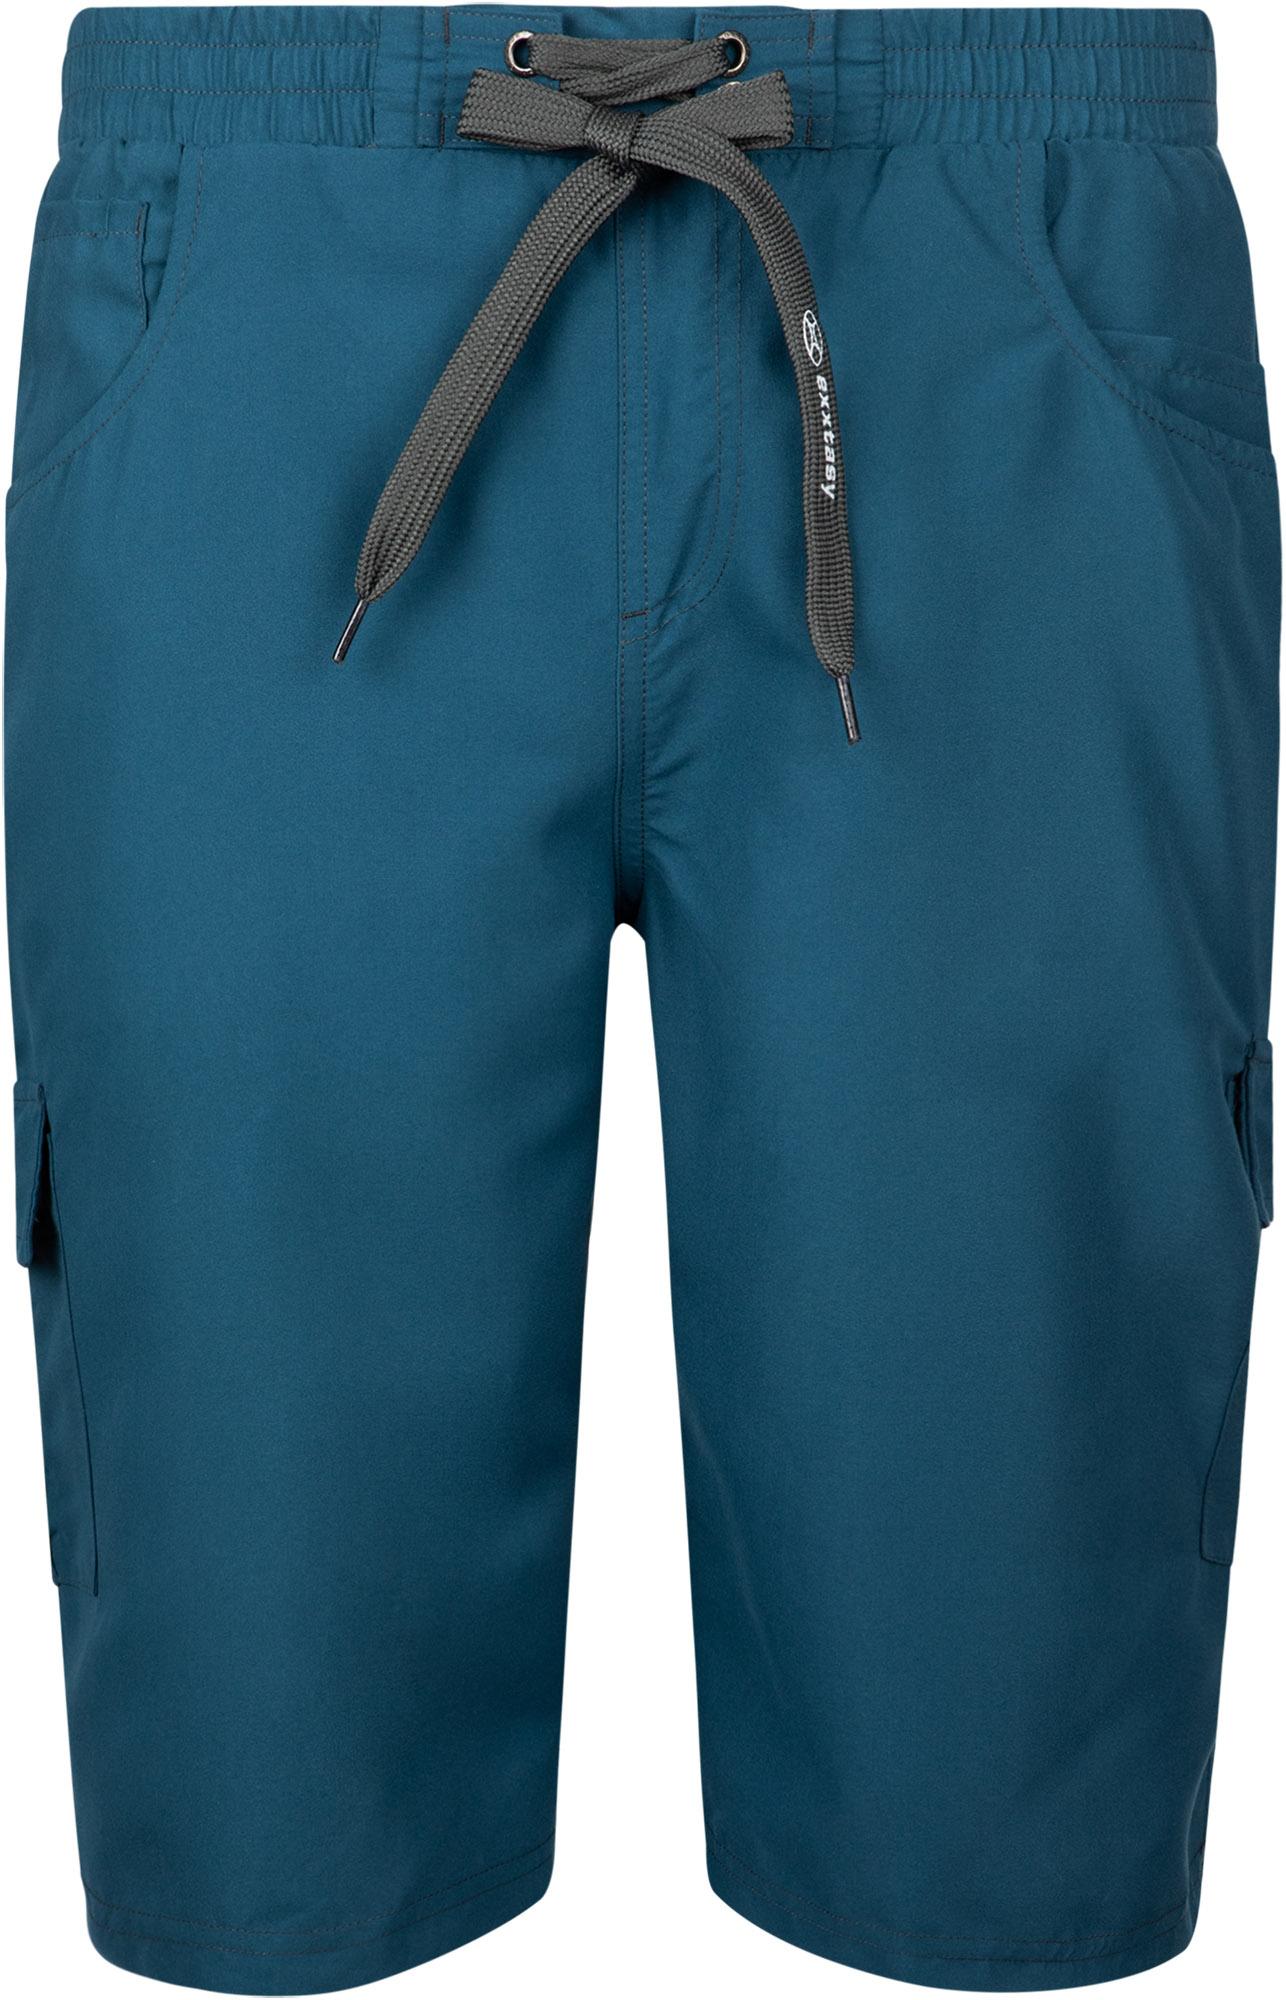 Exxtasy Шорты пляжные мужские Exxtasy Toronto, размер 48-50 exxtasy шорты пляжные мужские exxtasy tracy размер 54 56